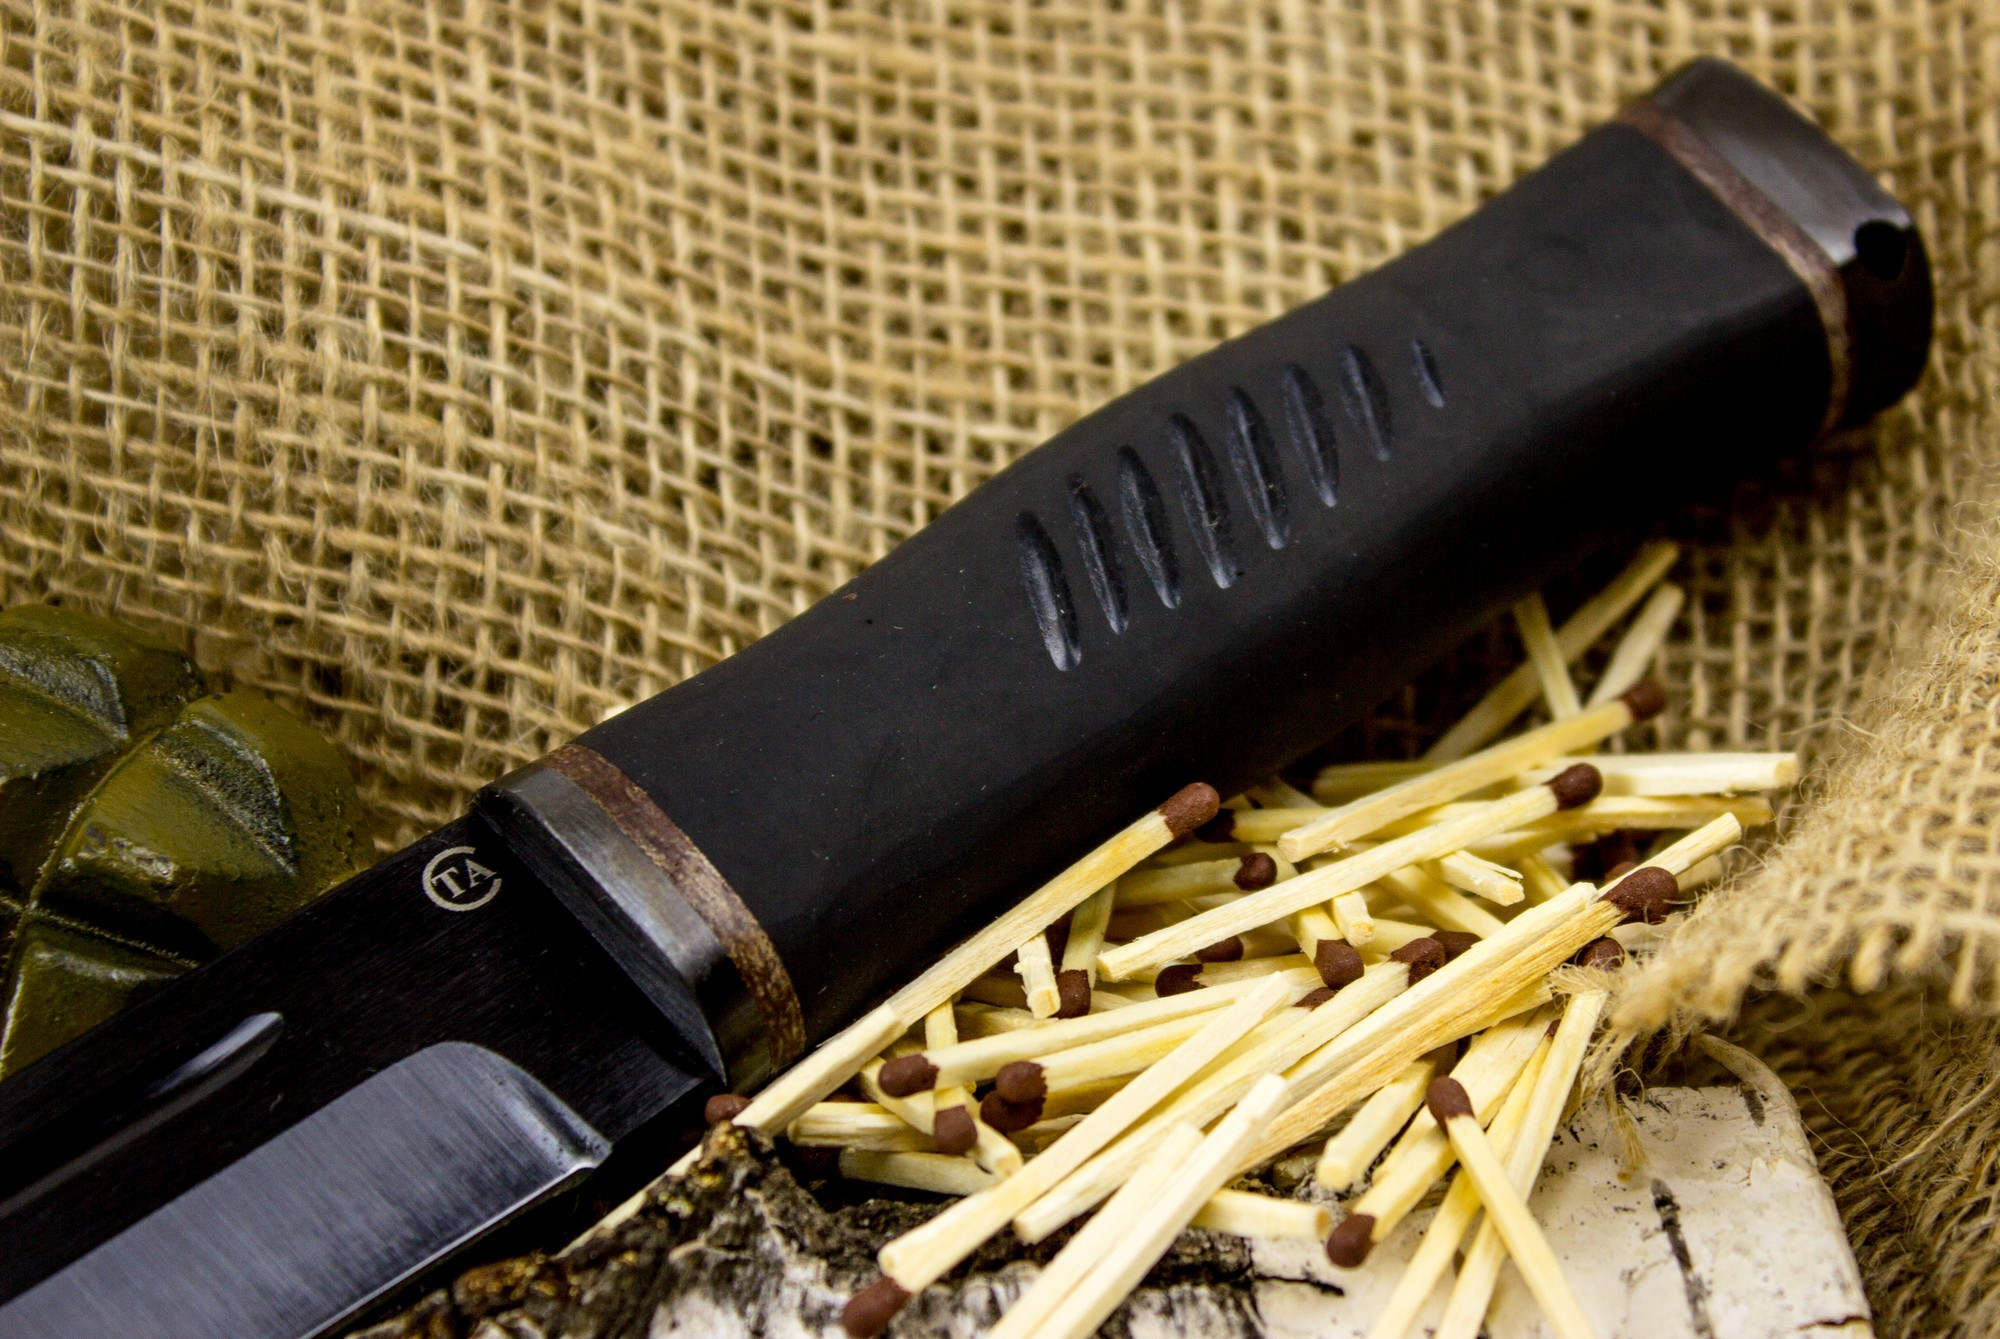 Фото 4 - Нож Горец-2, сталь 65Г, резина от Титов и Солдатова